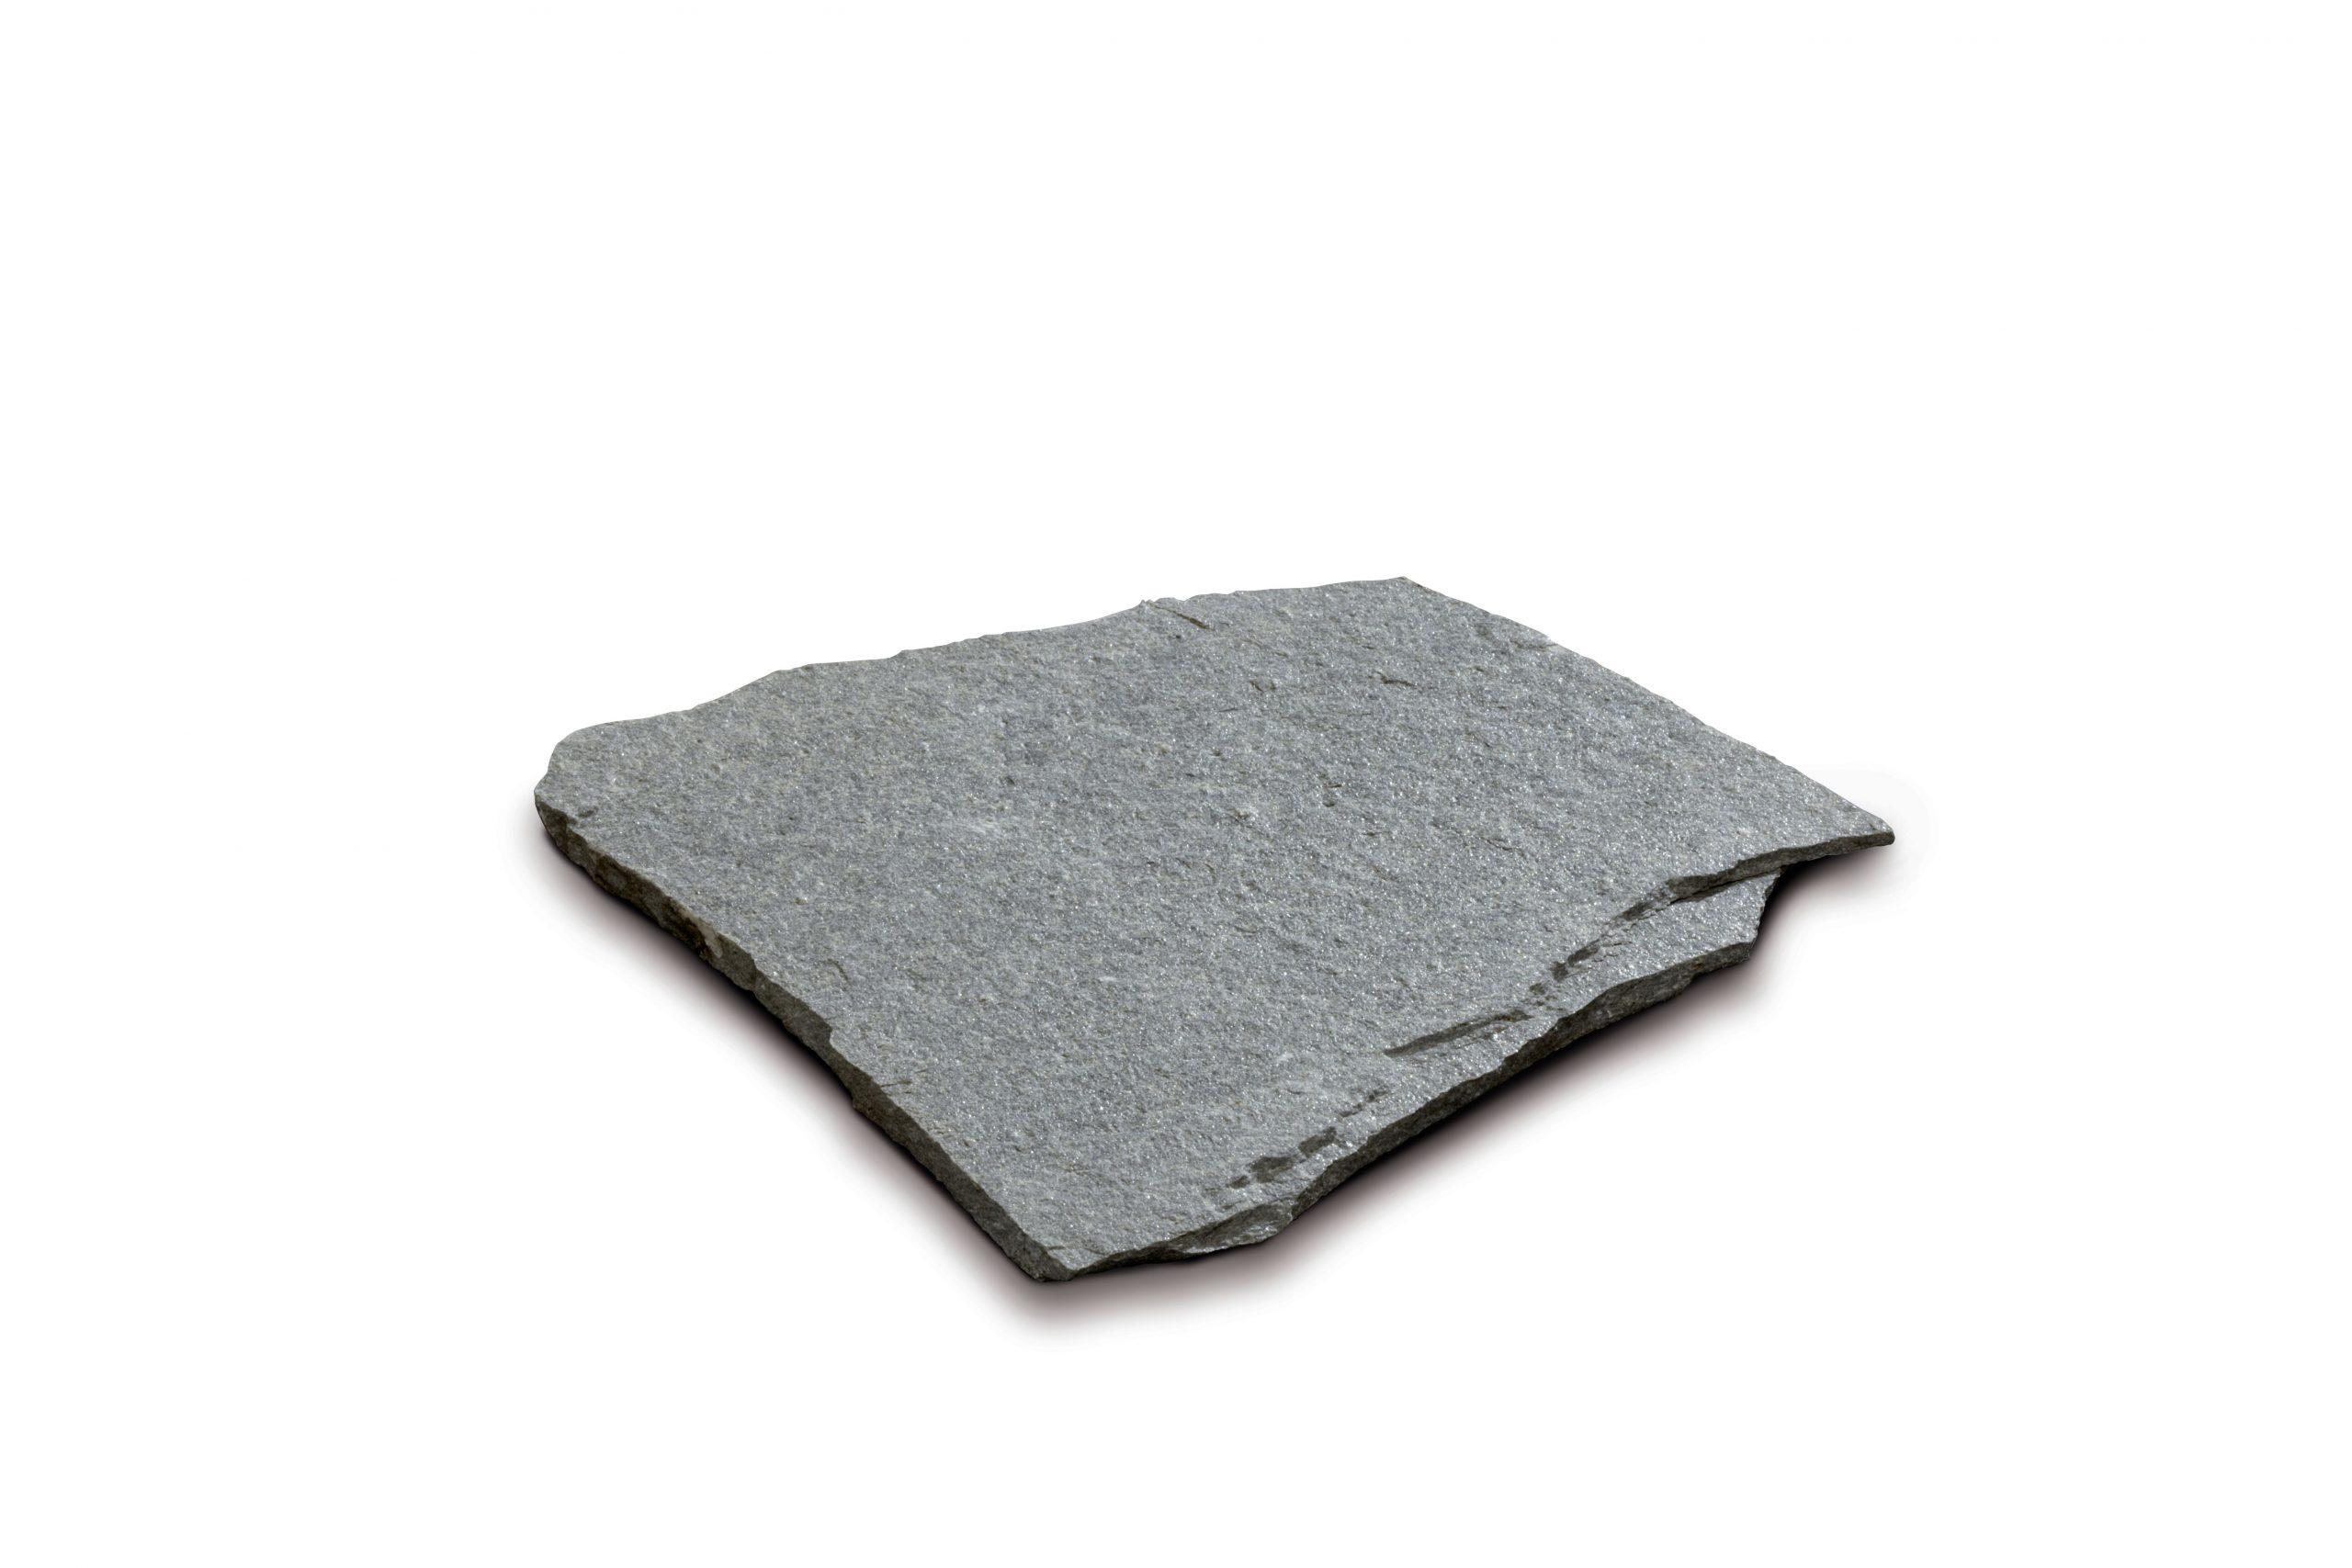 Steinplatte polygonal, quarz silber